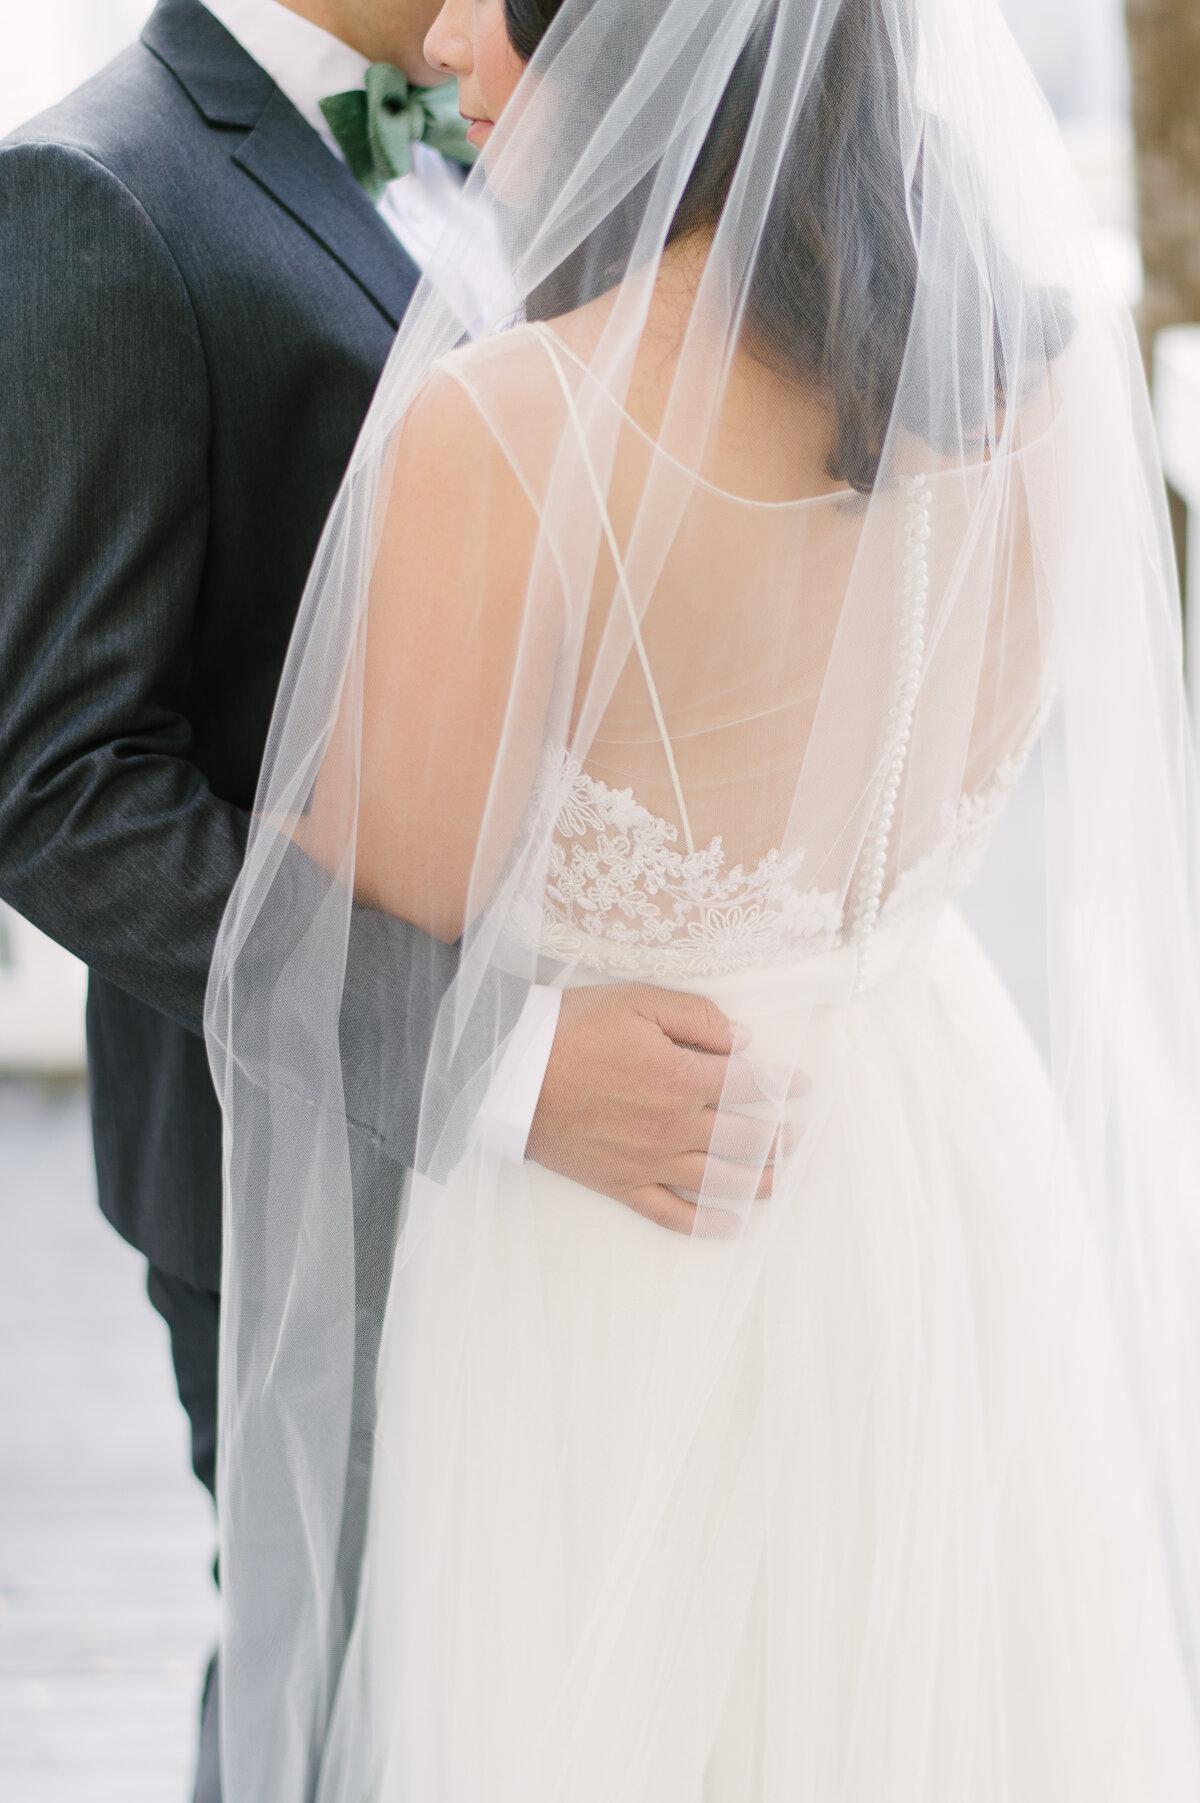 Jessica & Erik Wedding Gallery | Ashton Events | Full Service Wedding Planning, Design and Florals